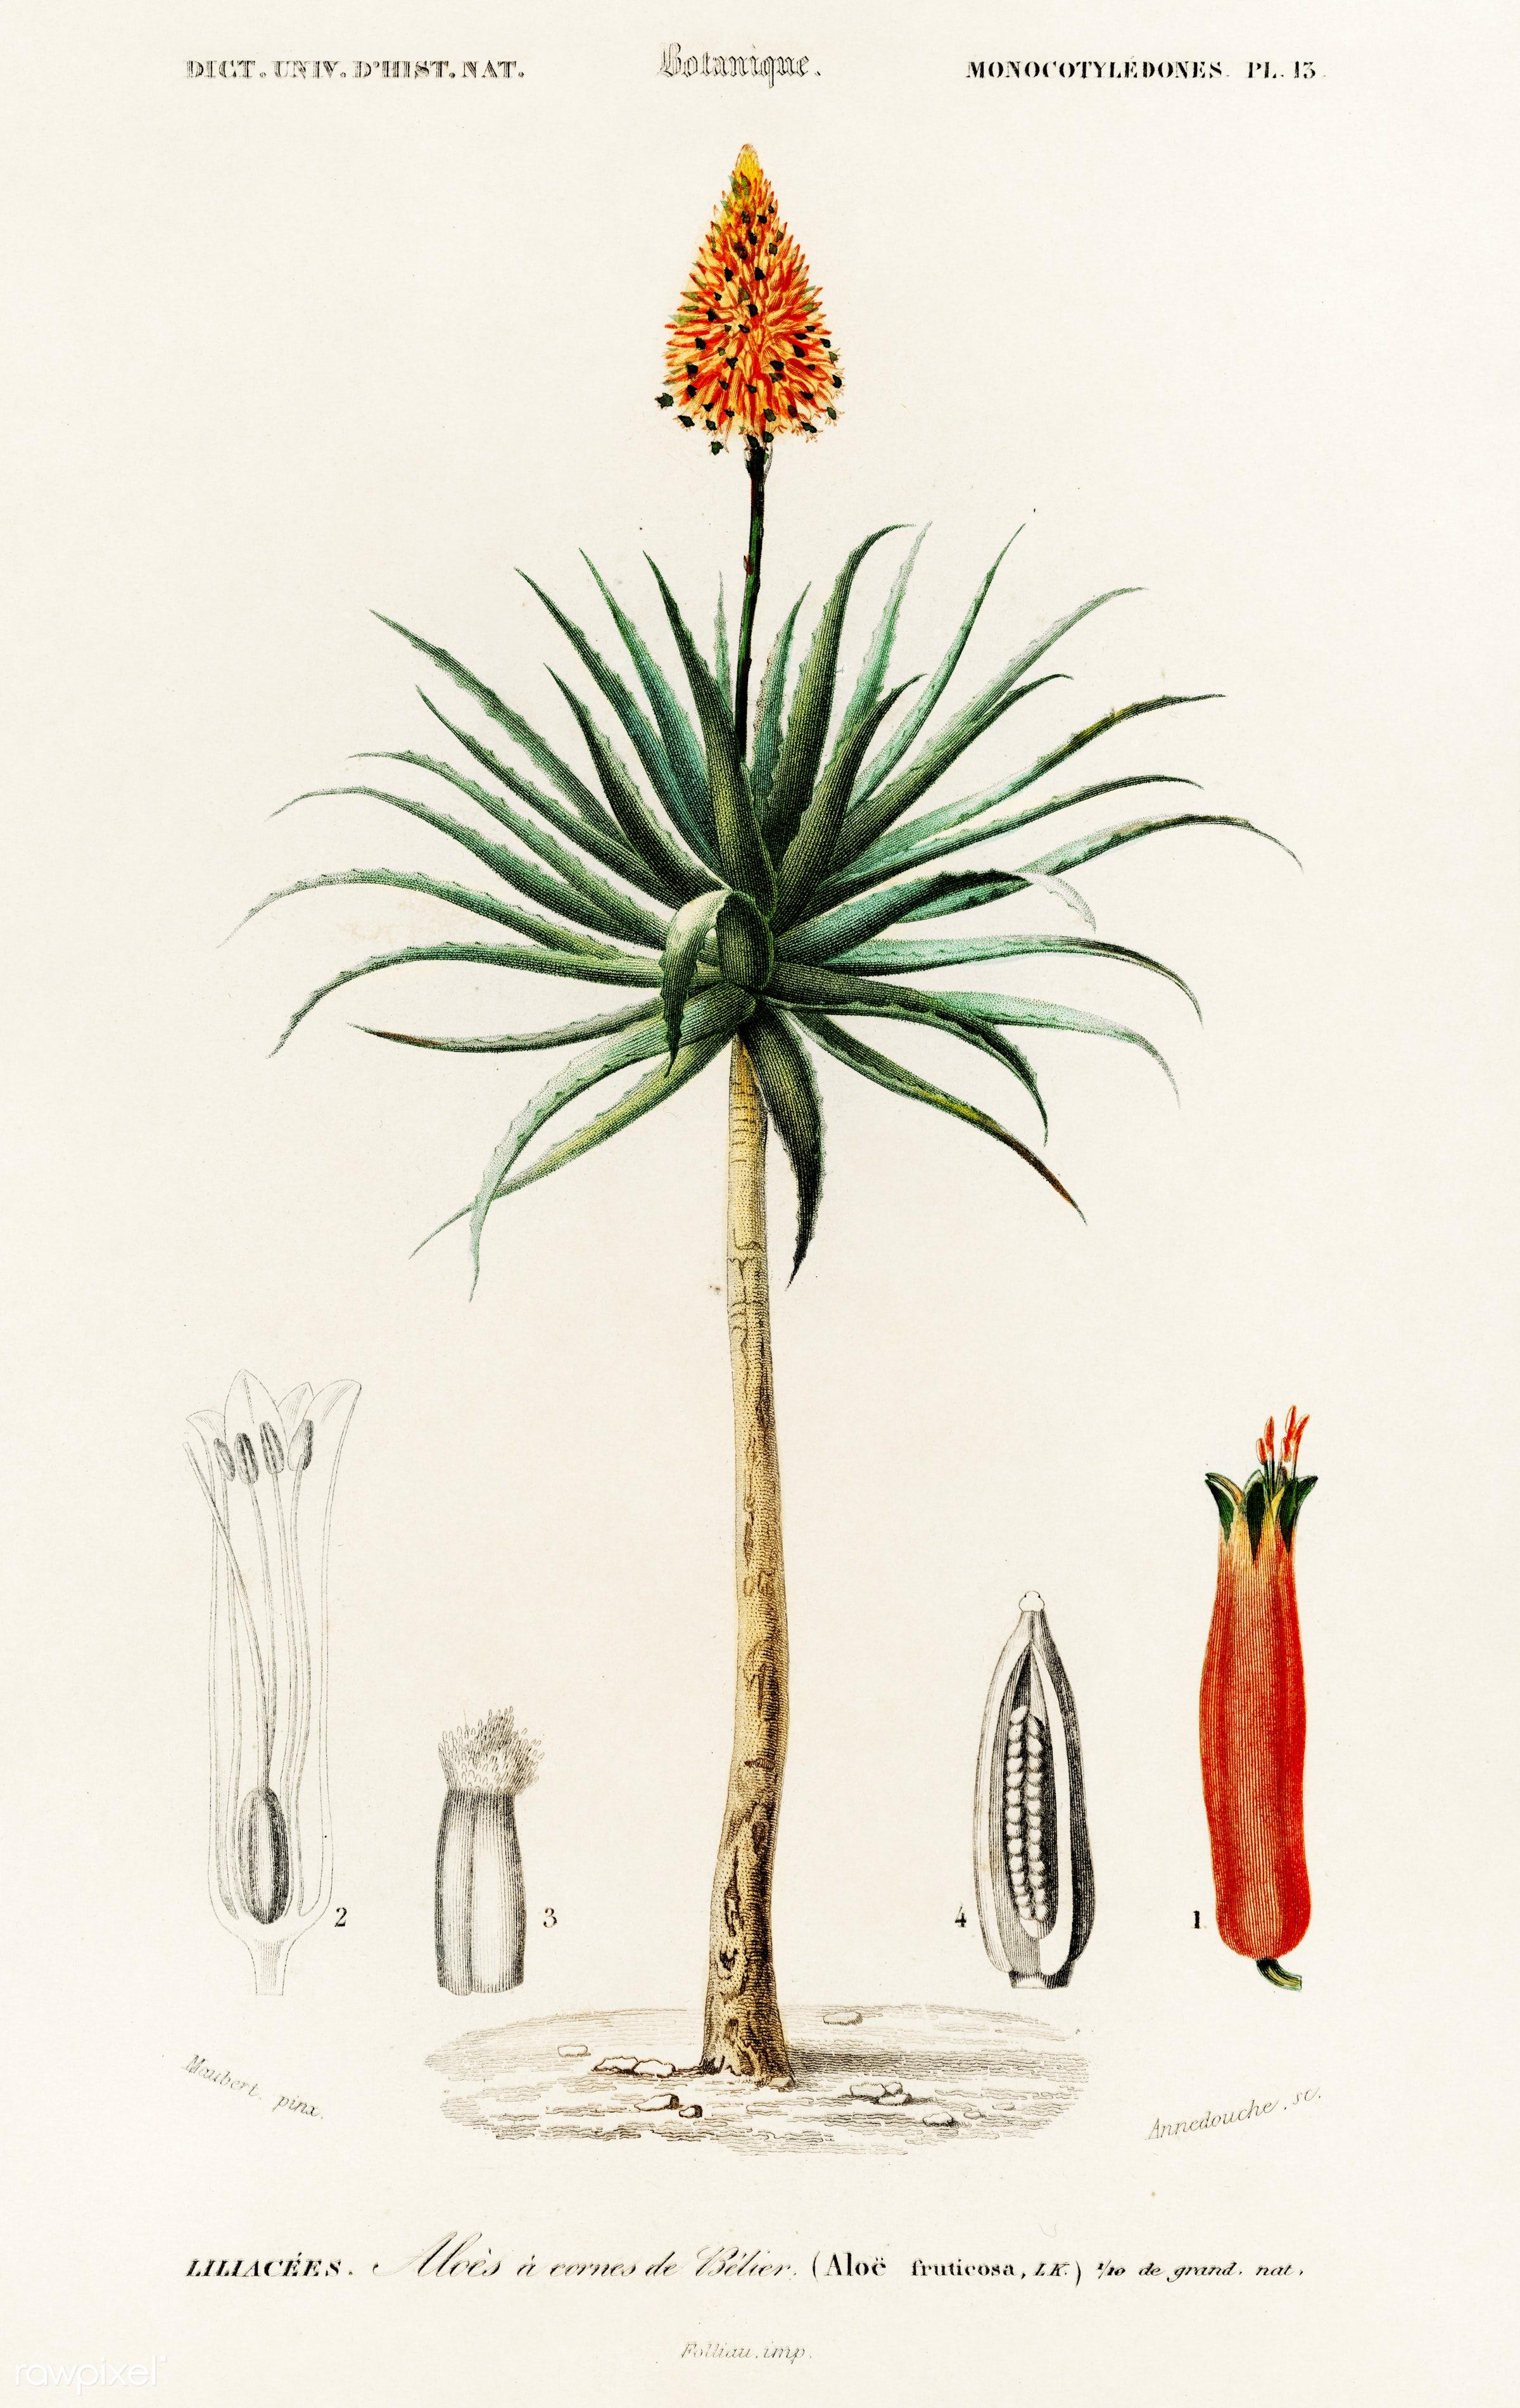 Candelabra aloe (aloe fruticosa) illustrated by Charles Dessalines D' Orbigny (1806-1876). Digitally enhanced from our...